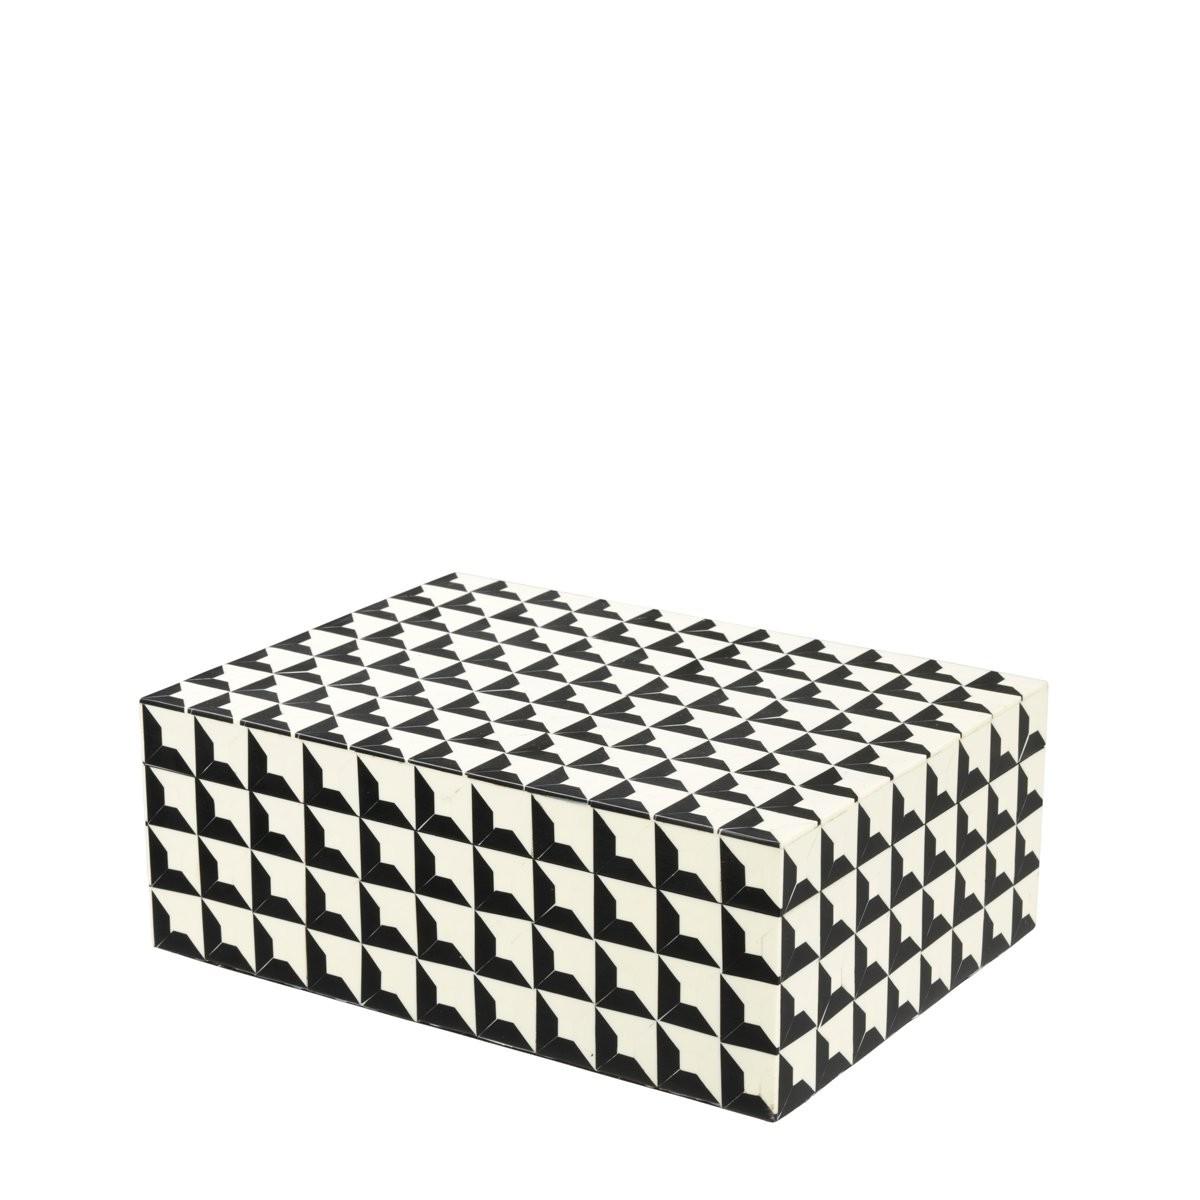 Cabas Small Black & White Box